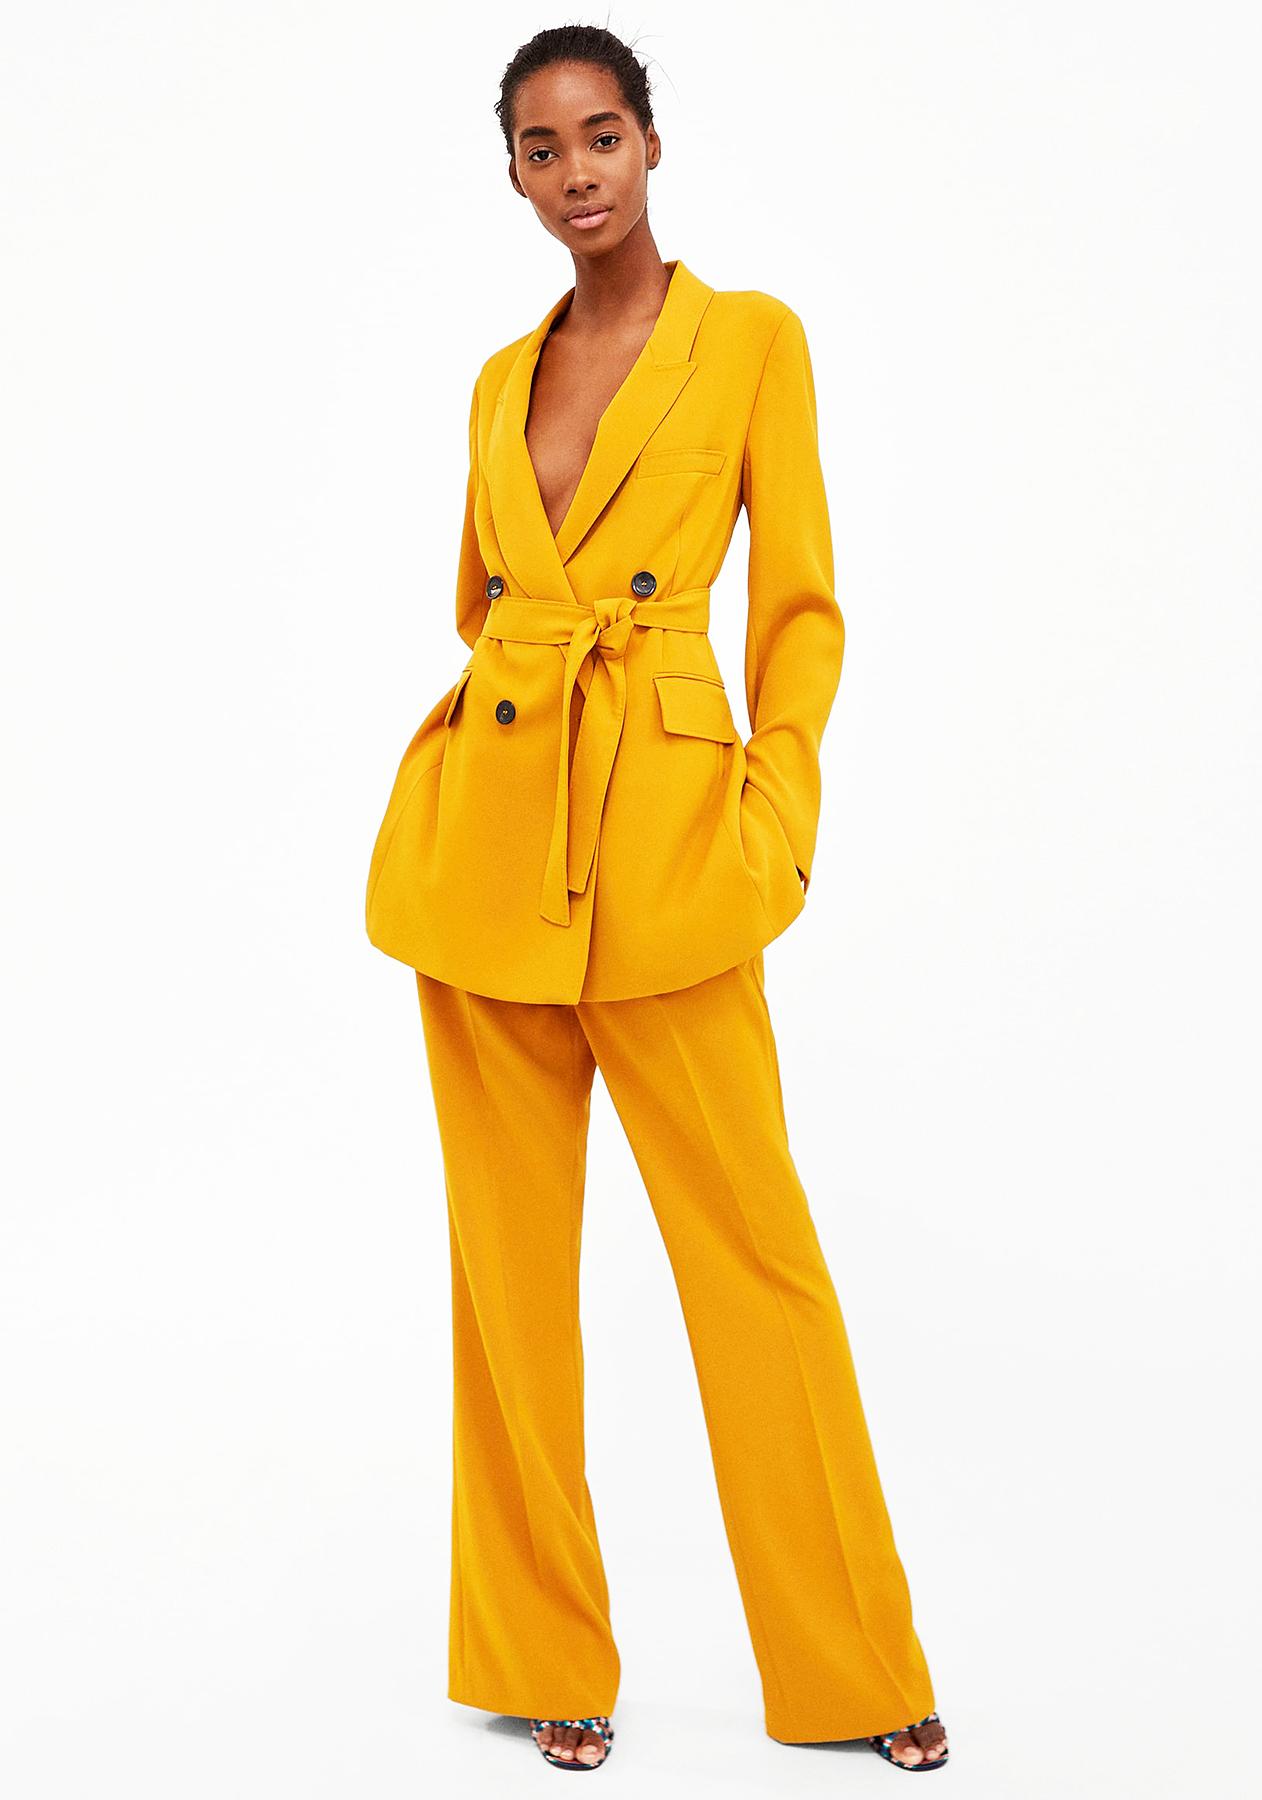 Emily Ratajkowski $200 Zara Wedding Suit: Details